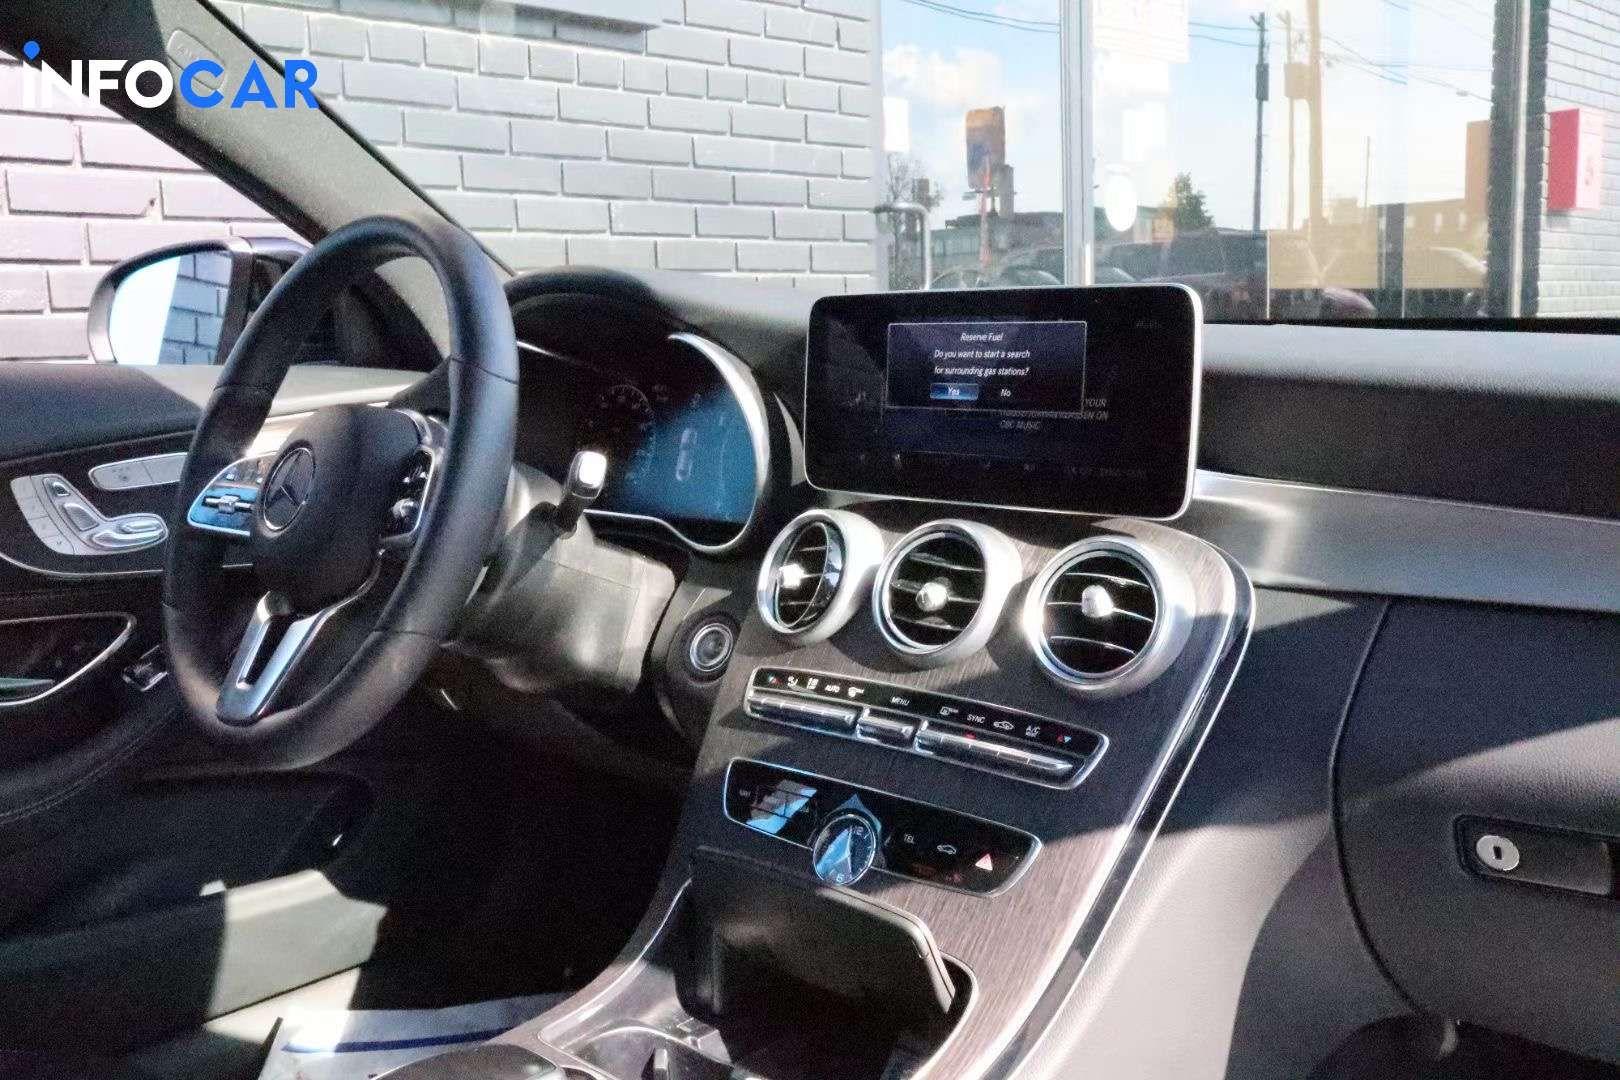 2019 Mercedes-Benz C-Class C300 - INFOCAR - Toronto's Most Comprehensive New and Used Auto Trading Platform